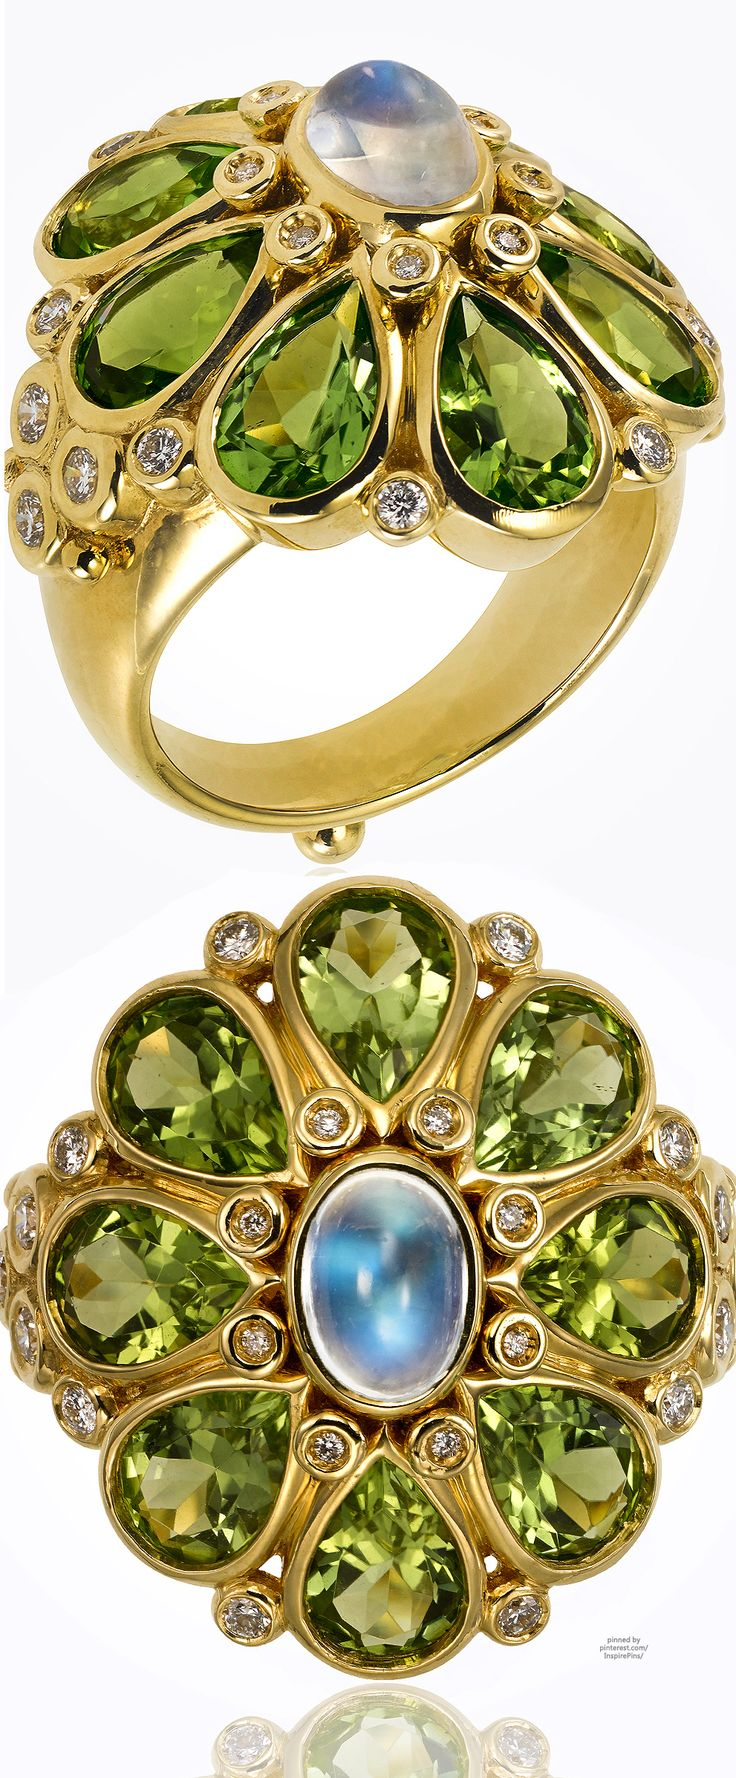 Temple St. Clair 18K Blossom Ring | Blue Moonstone, Peridot, Diamonds